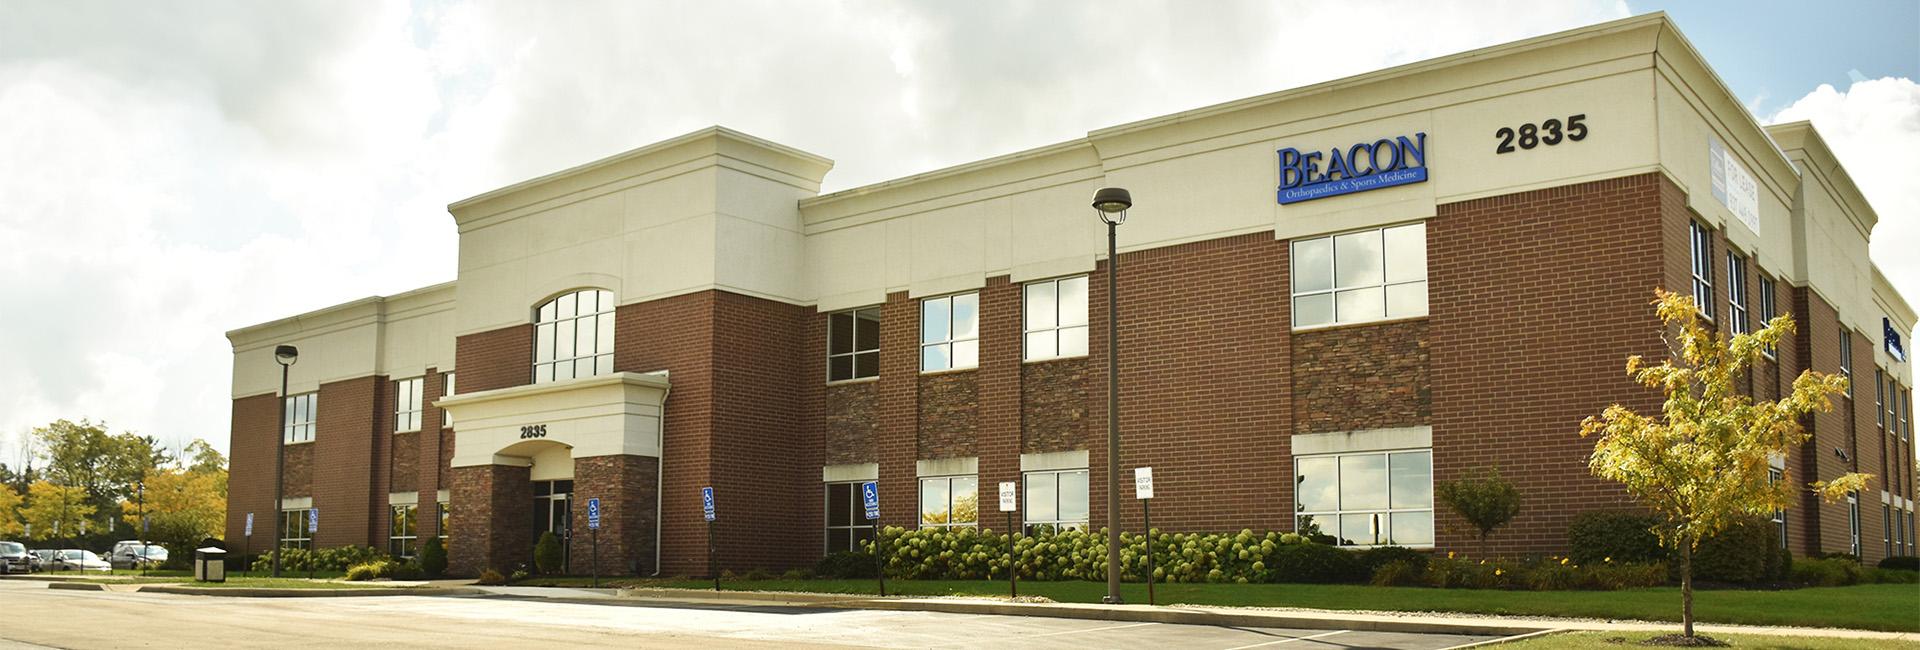 Miamisburg (Dayton)   Beacon Orthopaedics & Sports Medicine